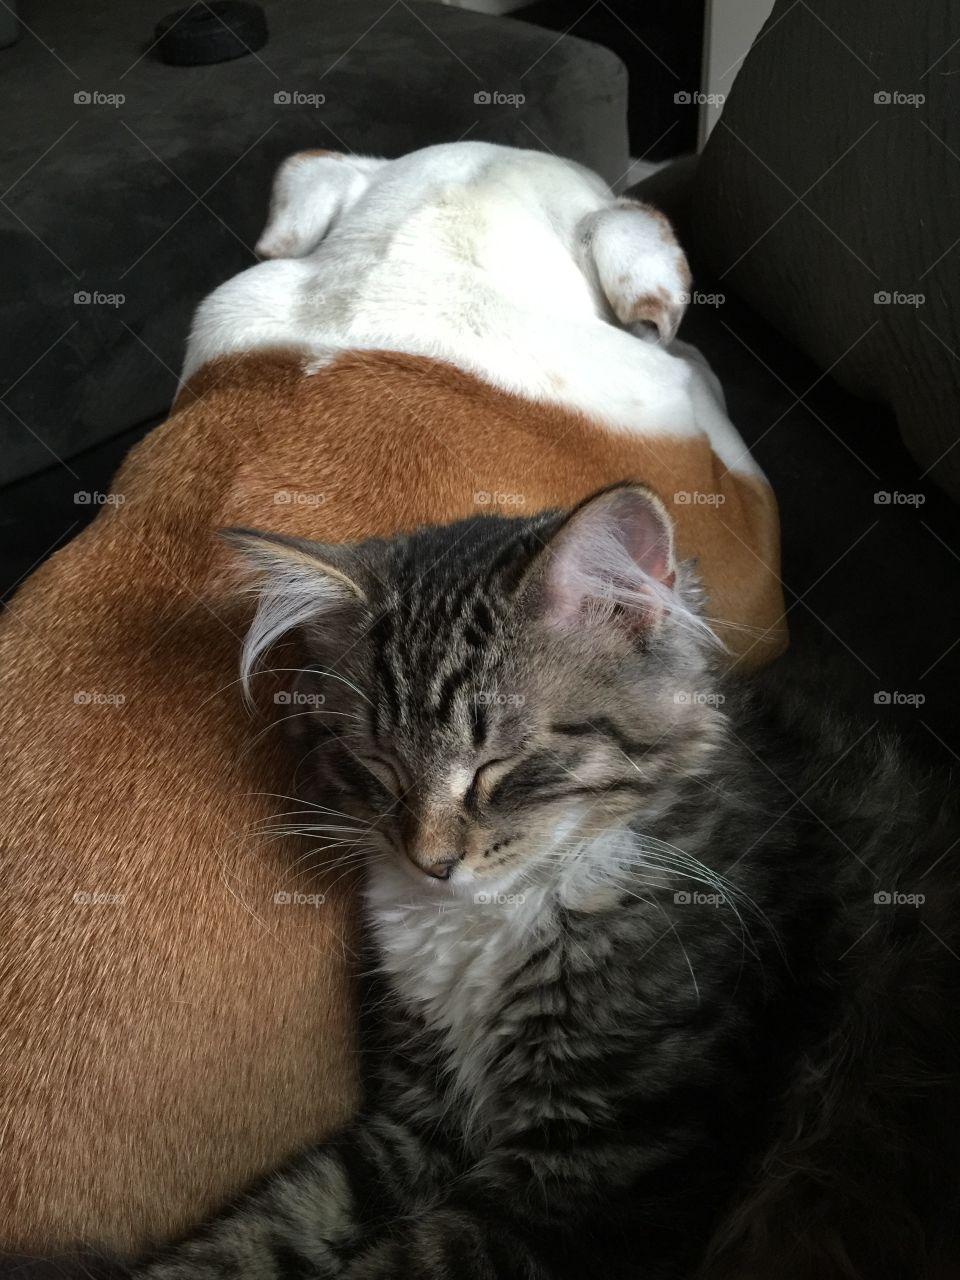 Family love. Kitten snuggles puppy